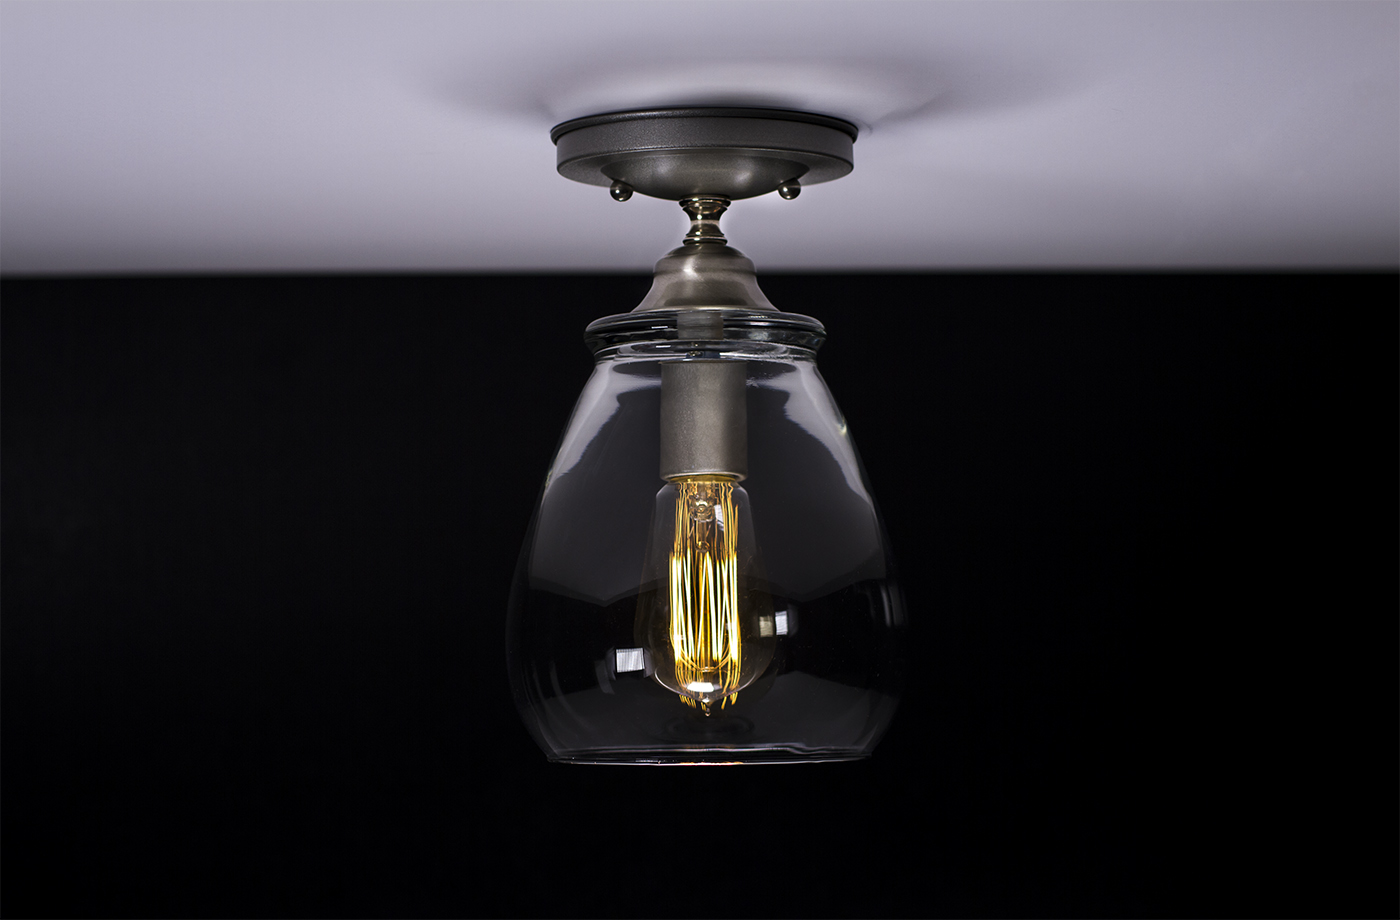 Ceiling Lights Edison : Flush ceiling mount edison light fixture brushed